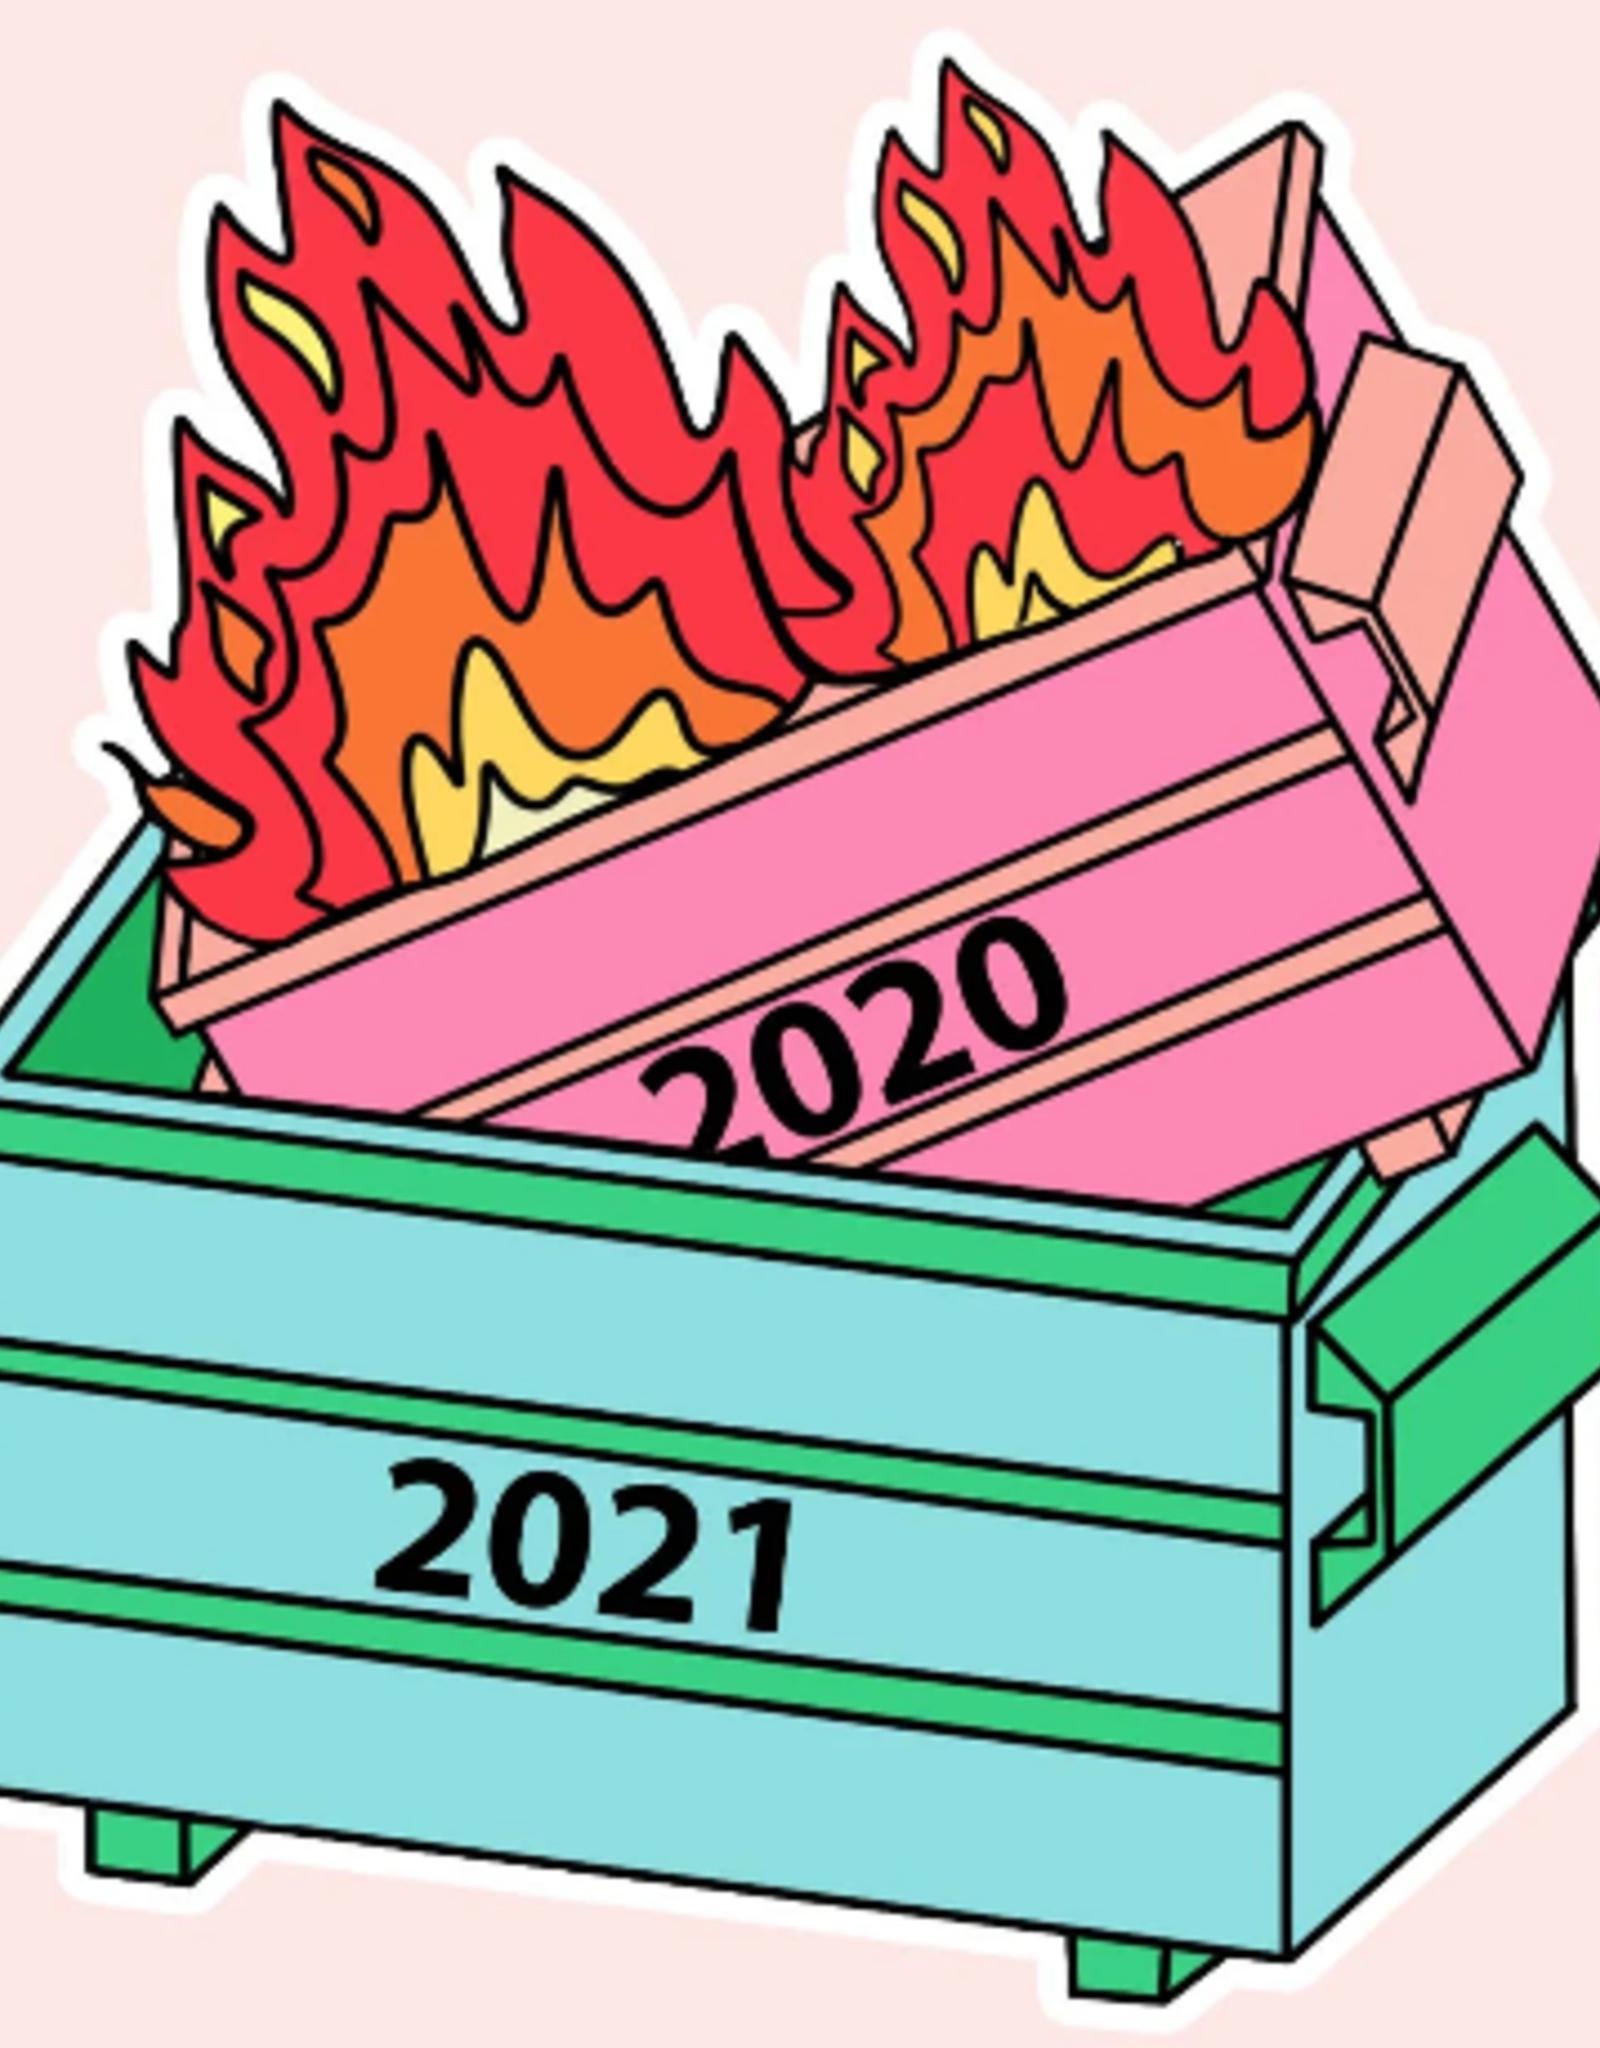 Wink Dumpster Fire Sticker